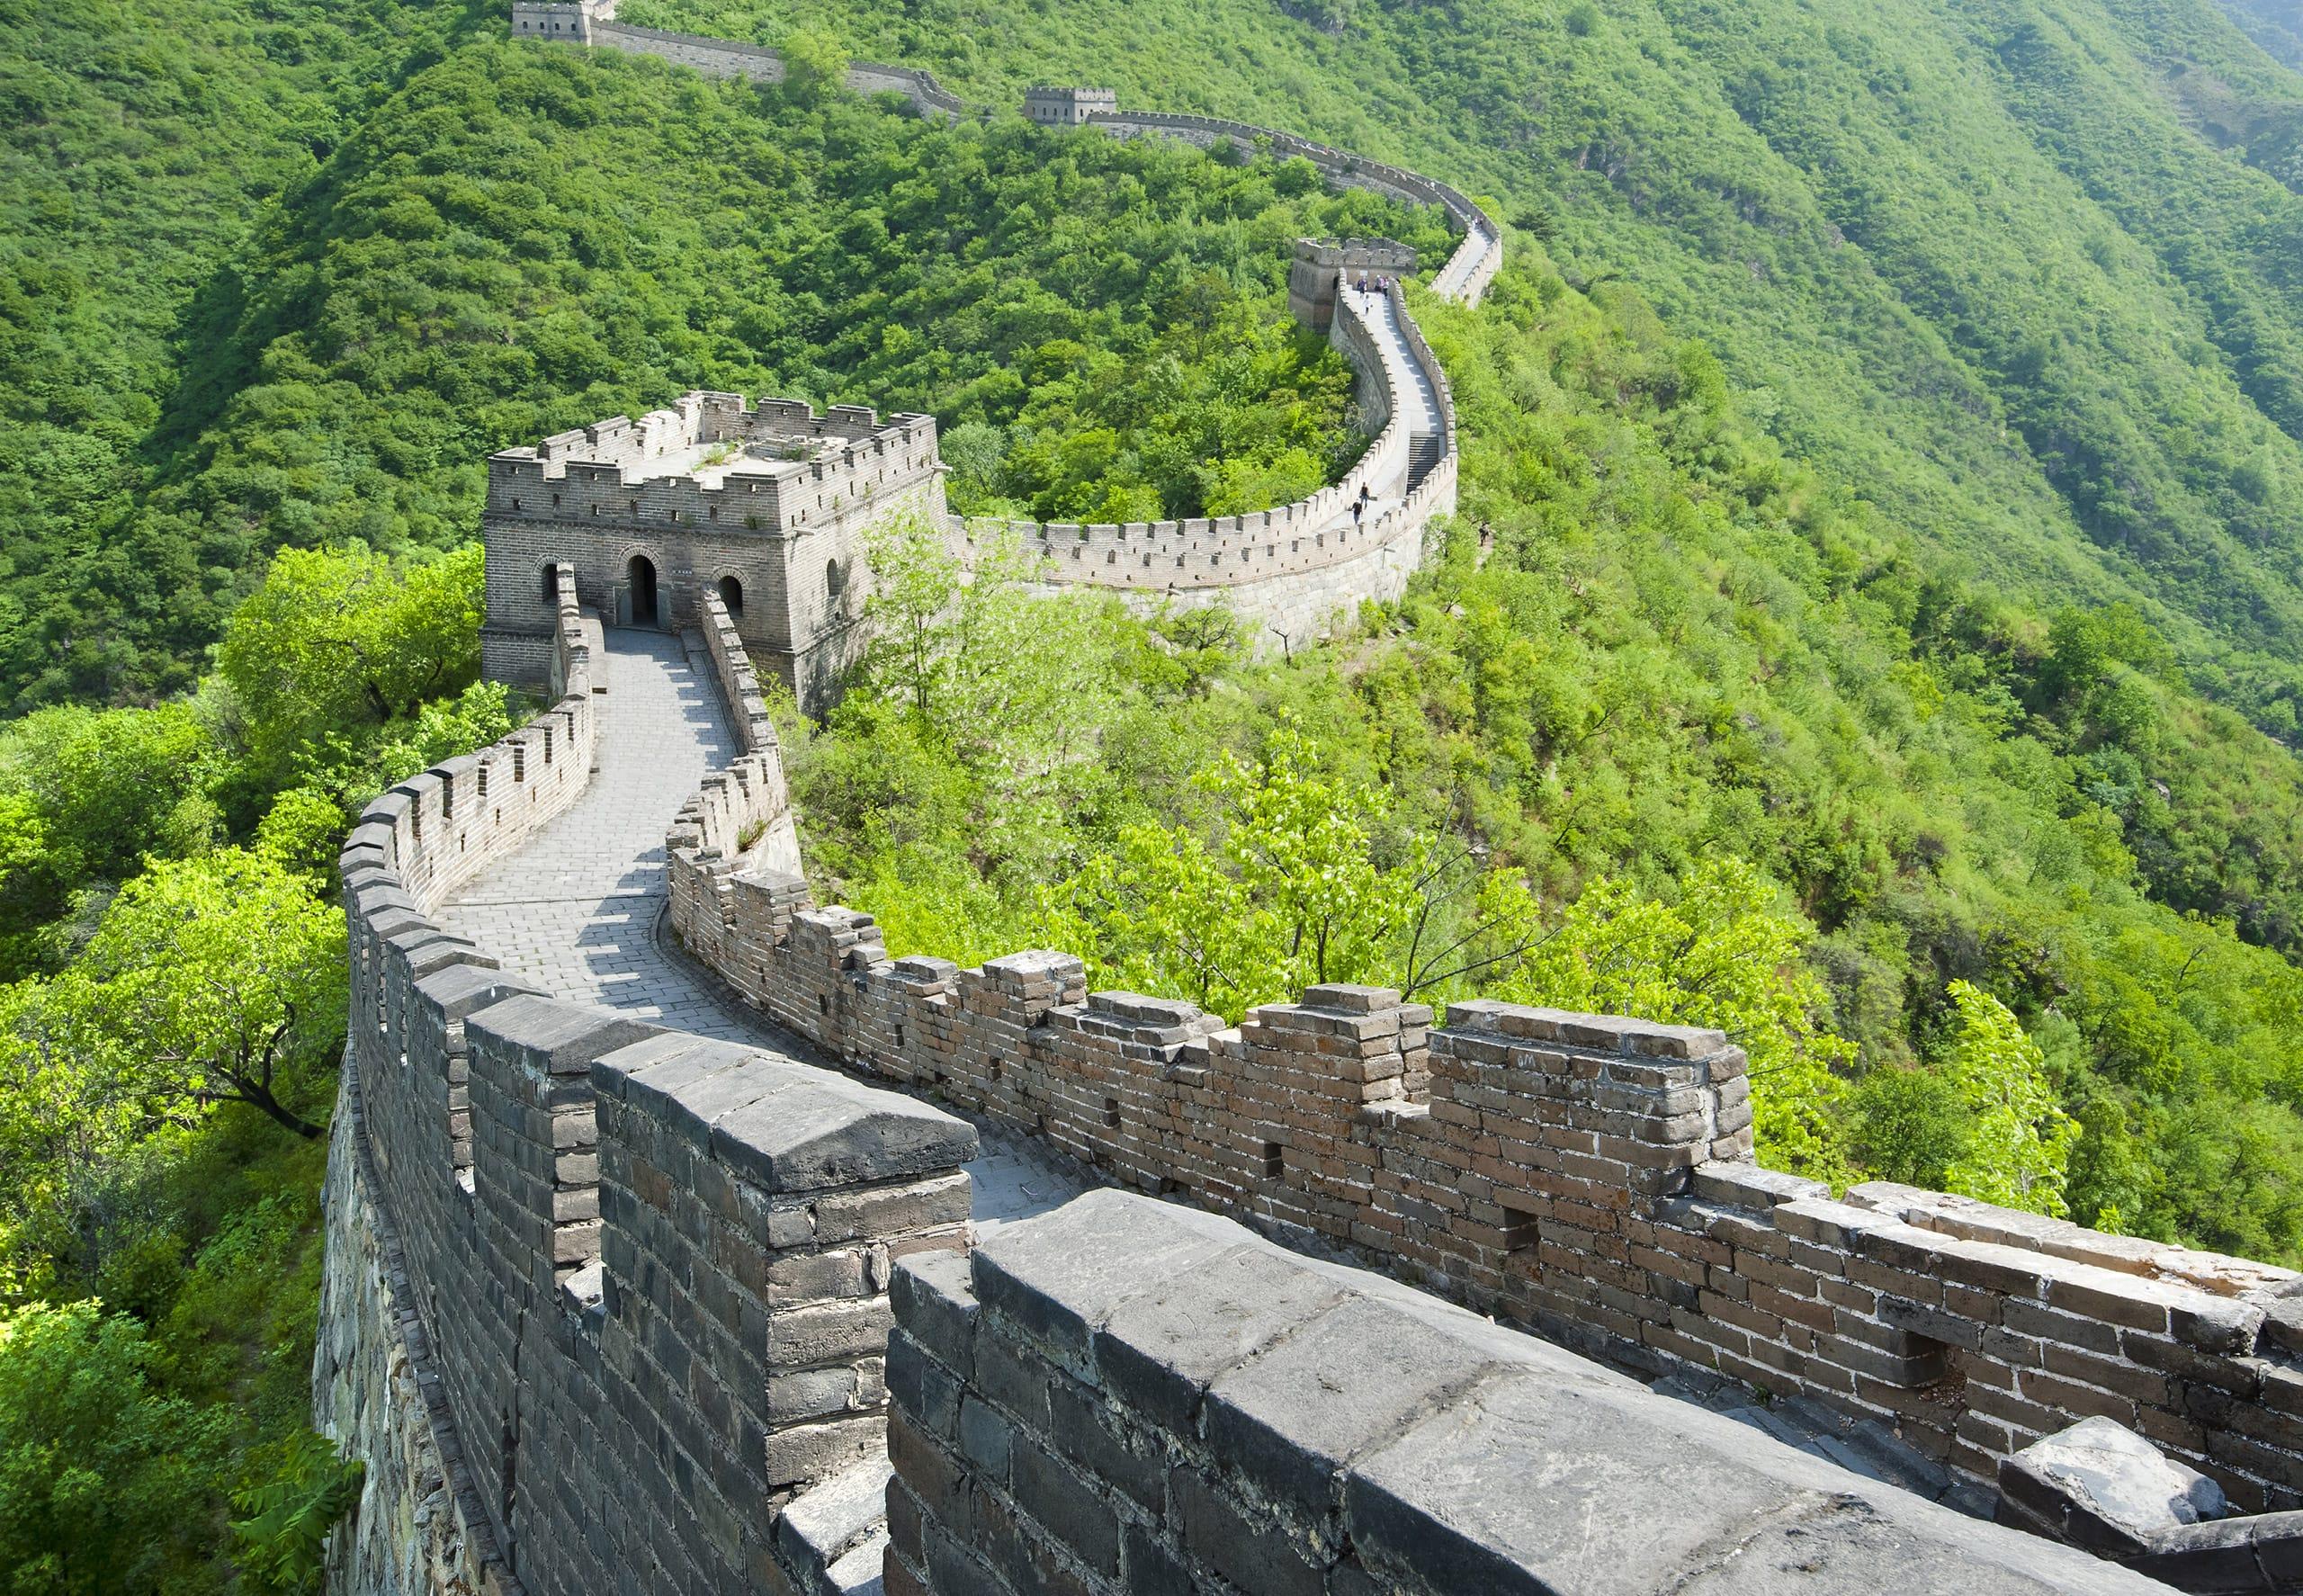 14-daagse groepsrondreis Keizerlijk China